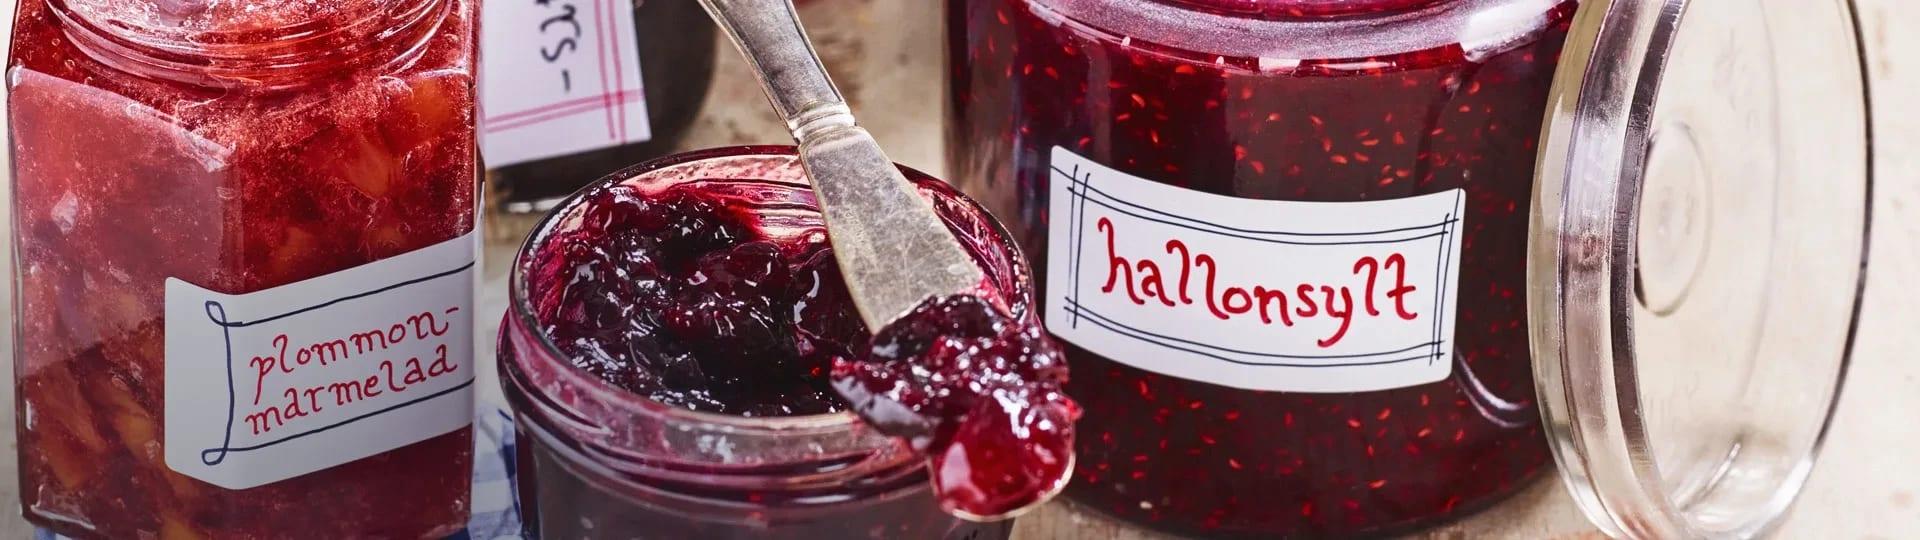 marmelad vs sylt